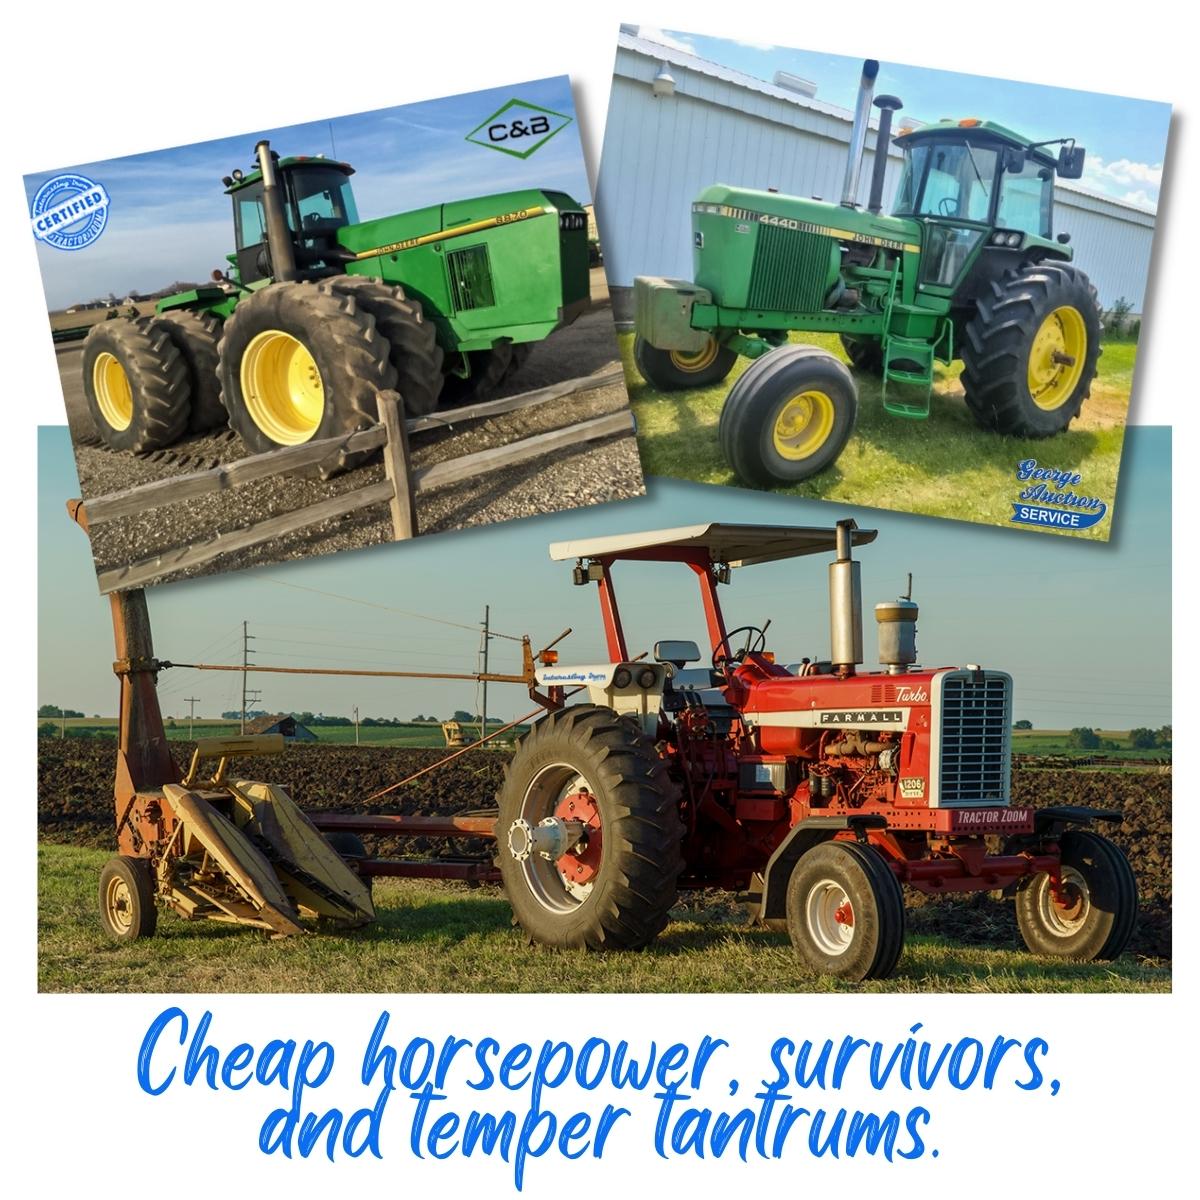 cheap horsepower and a survivor 4440